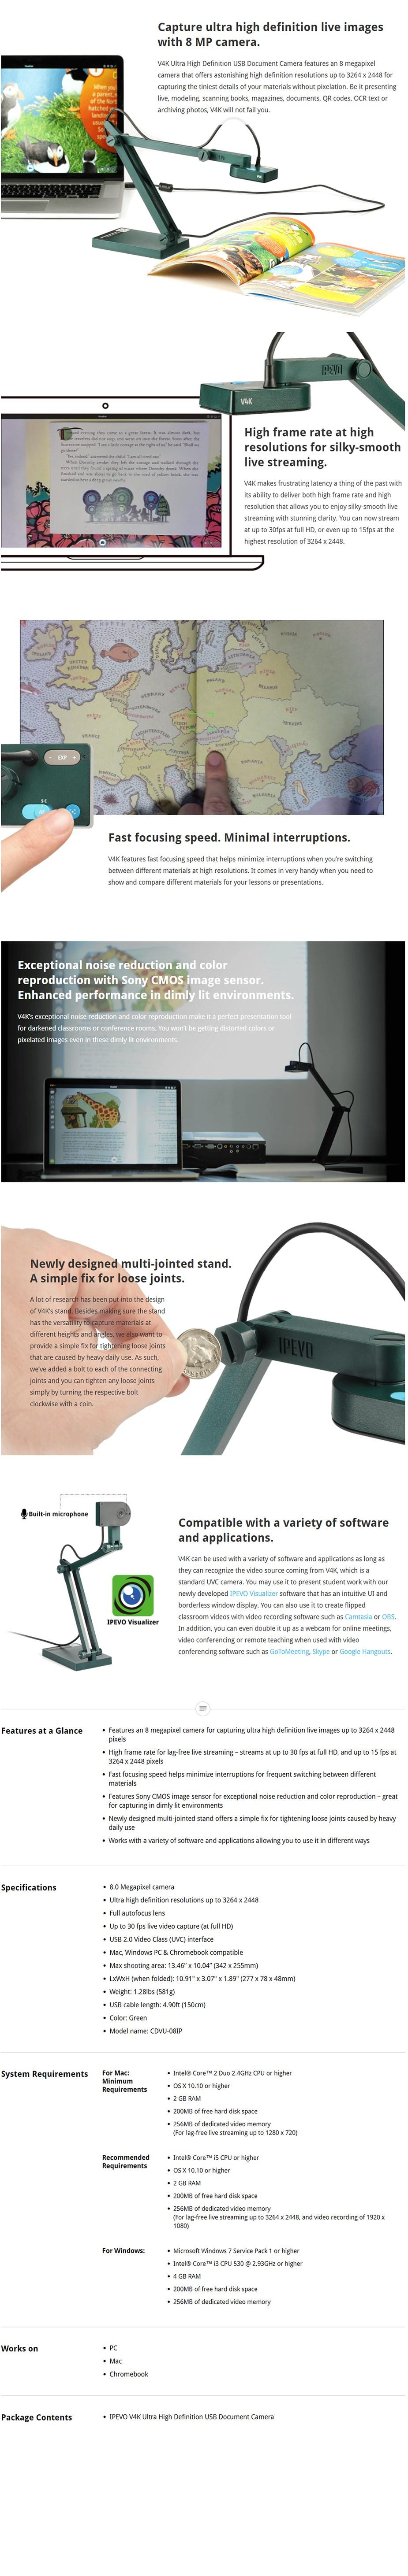 IPEVO V4K Ultra High Definition USB Document Camera - Desktop Overview